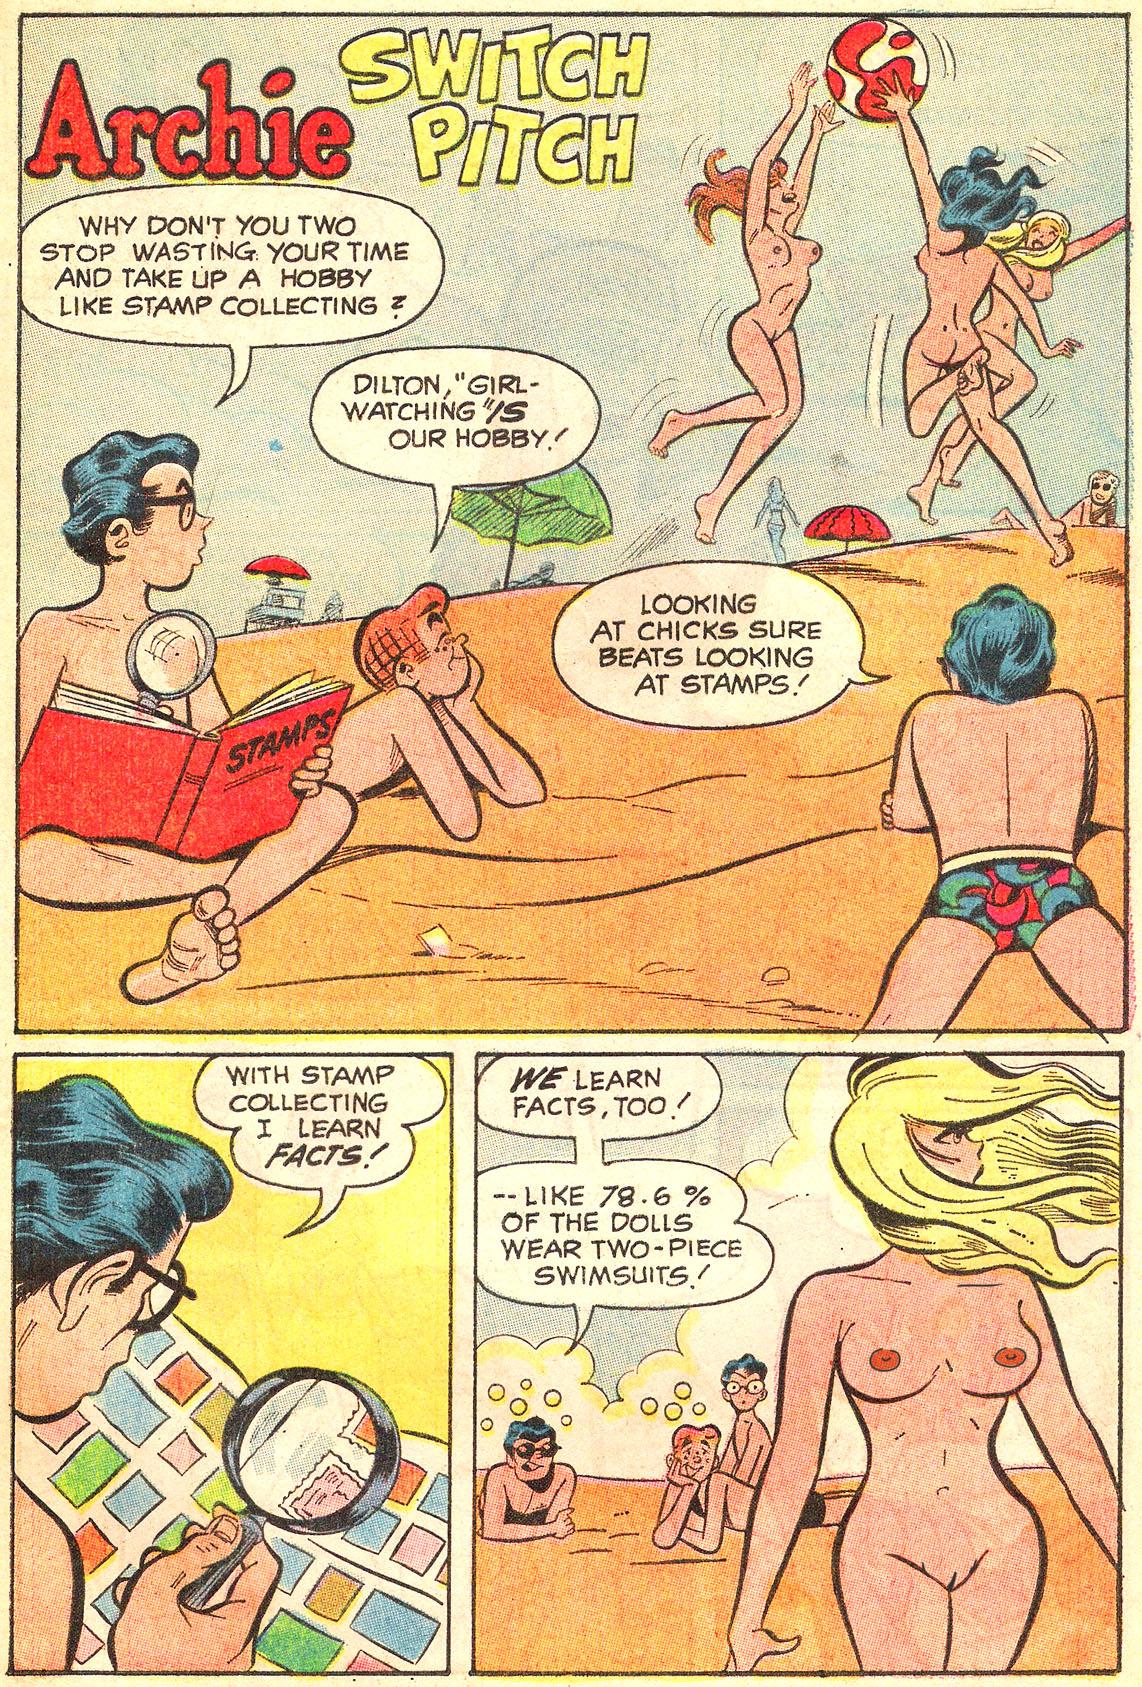 Archie Comics – Switch Pitch